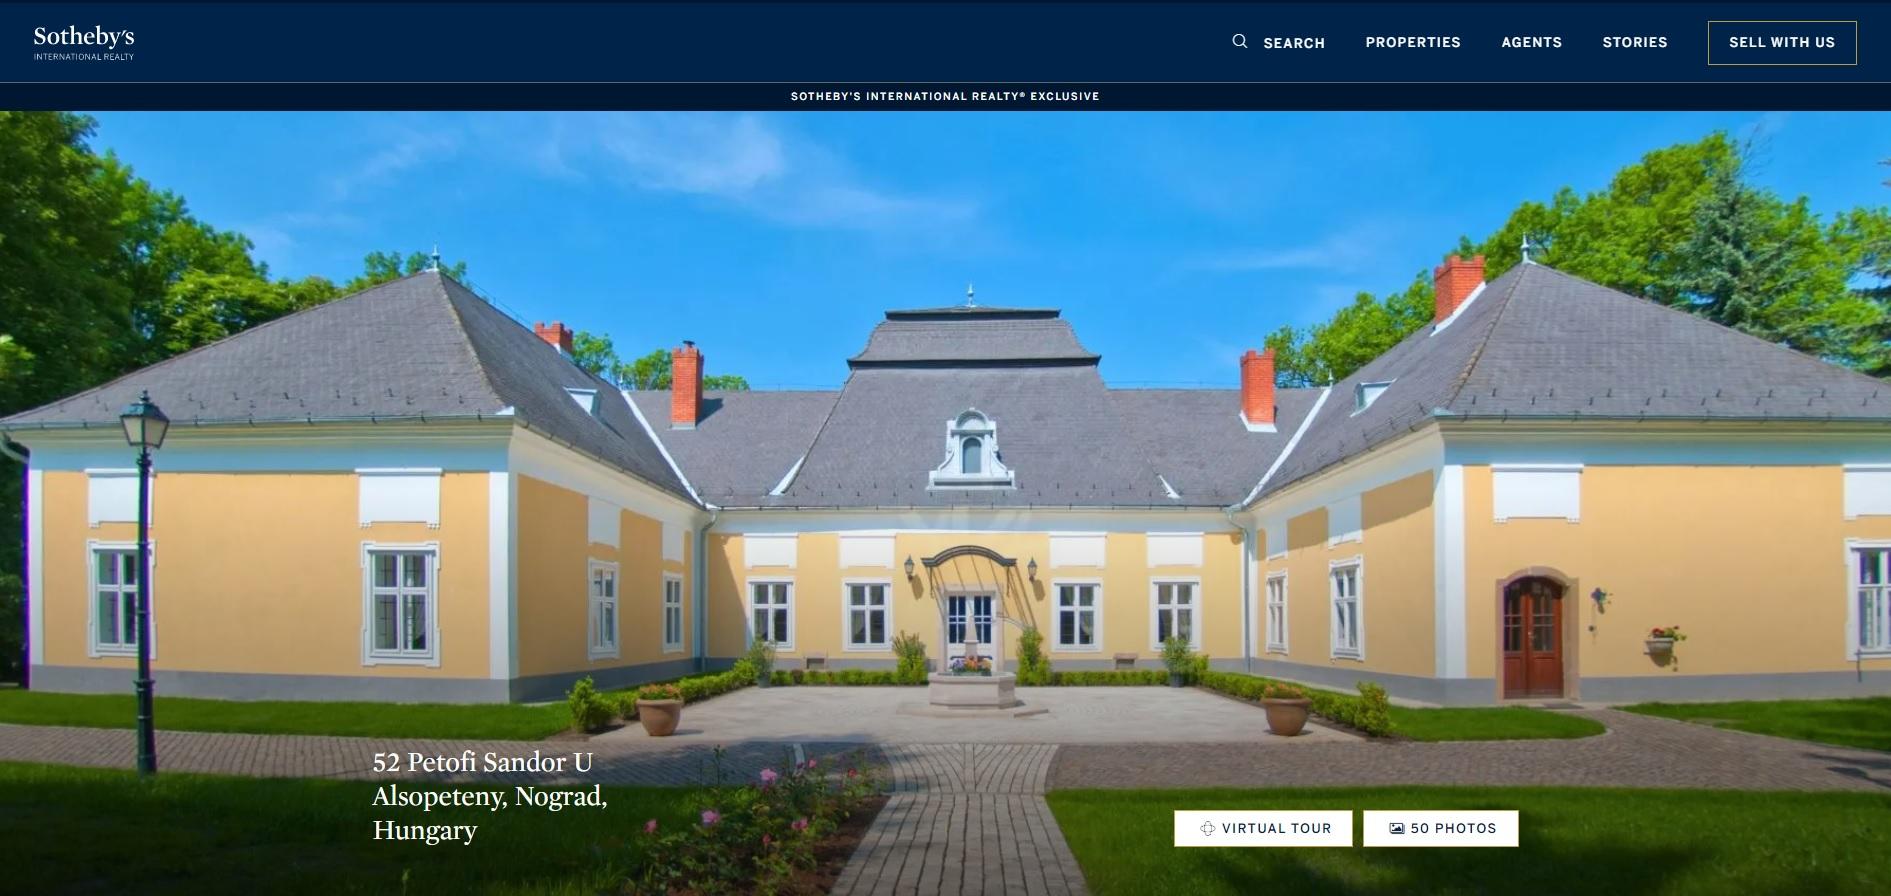 15 milliárd forintért árulják az alsópetényi Prónay-kastélyt